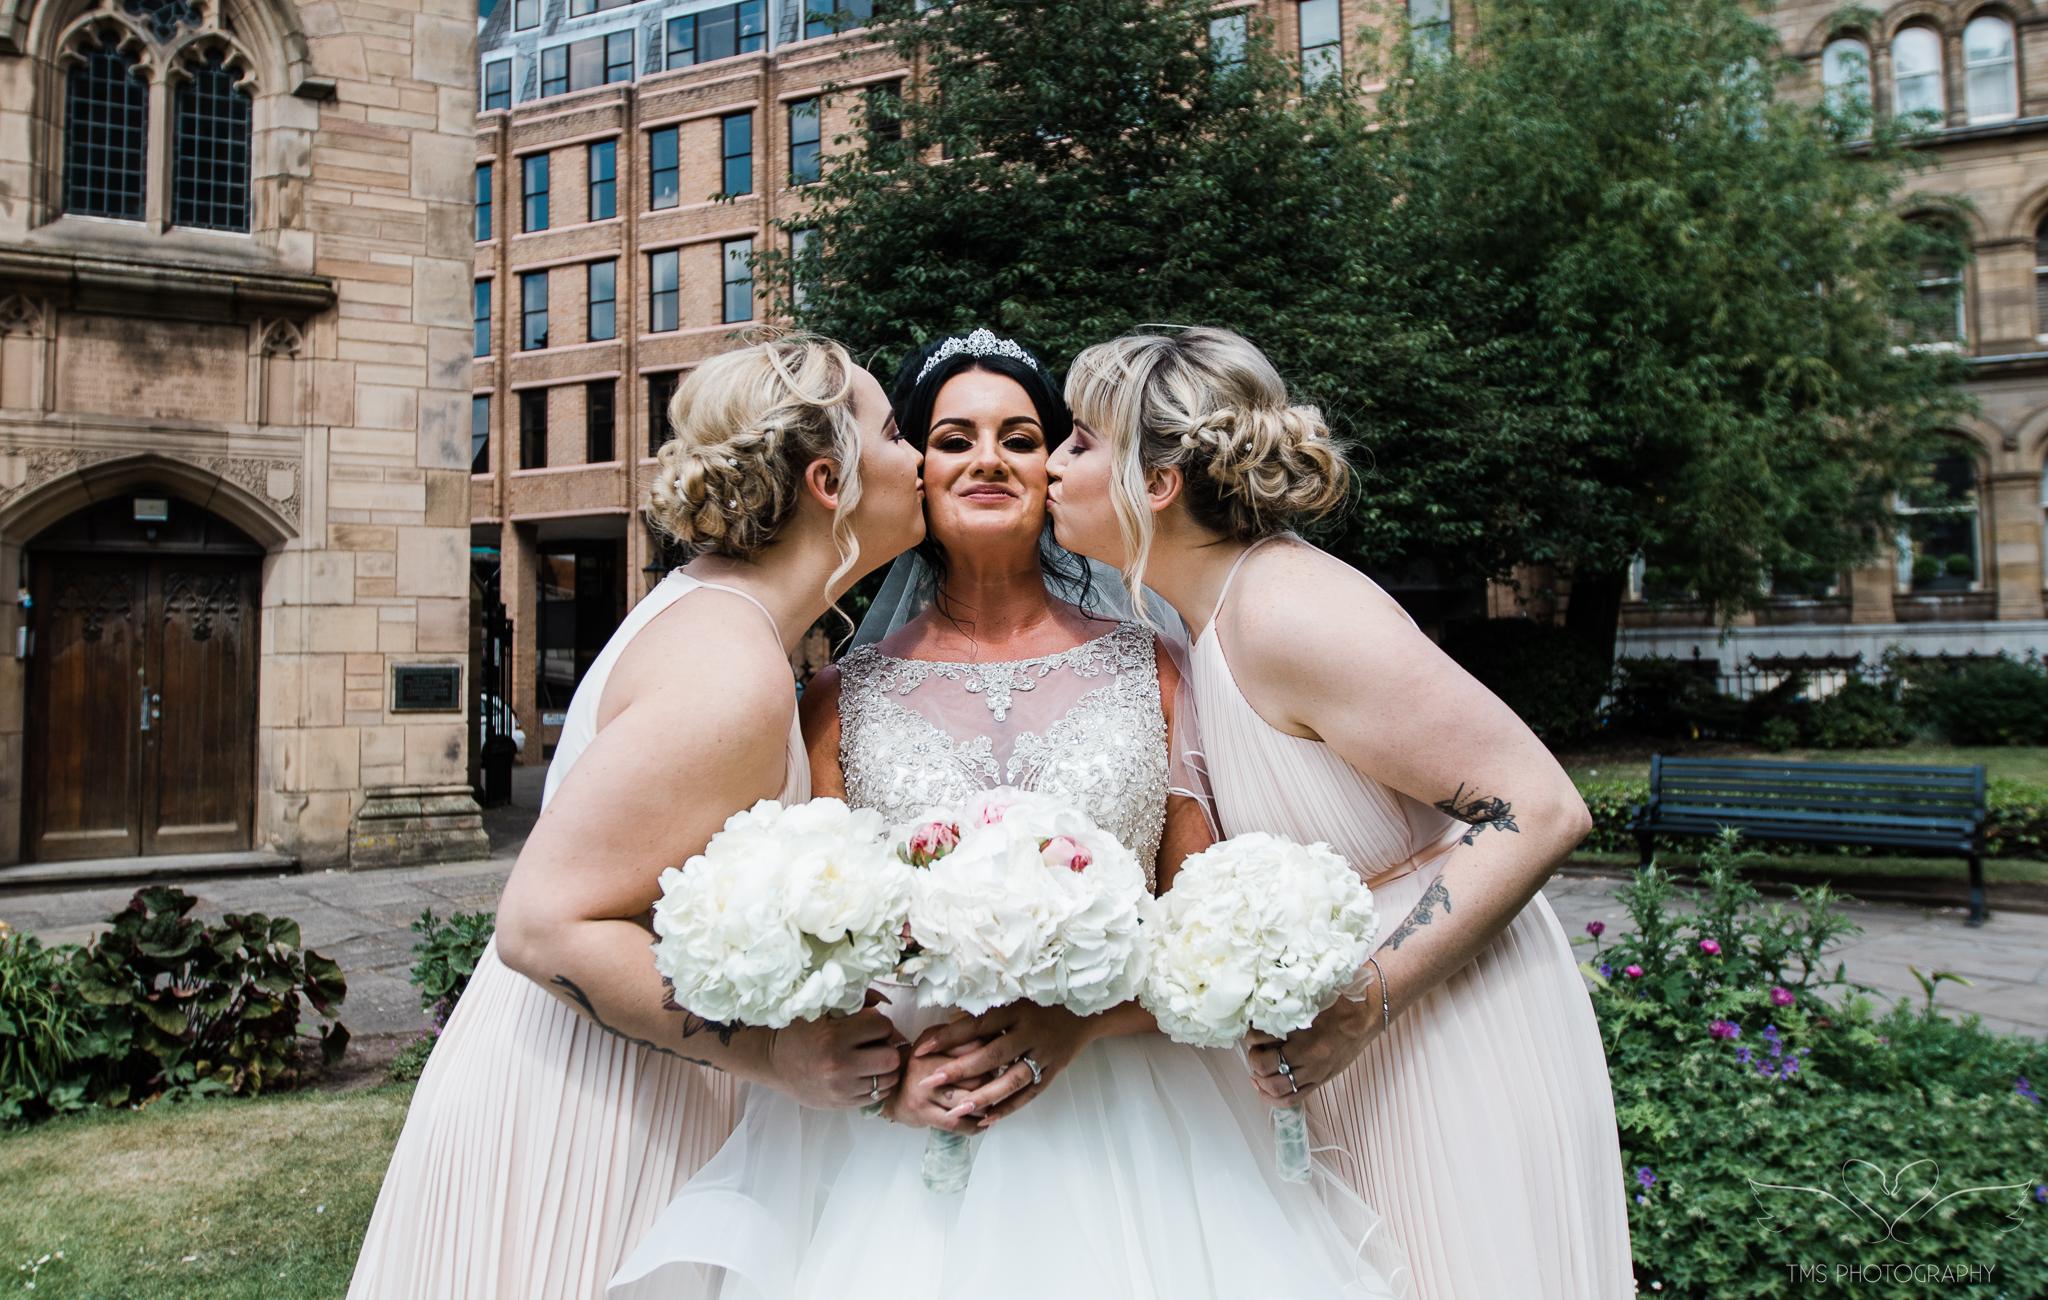 Wedding_photography_Hilton_liverpool_Albertdocks-98